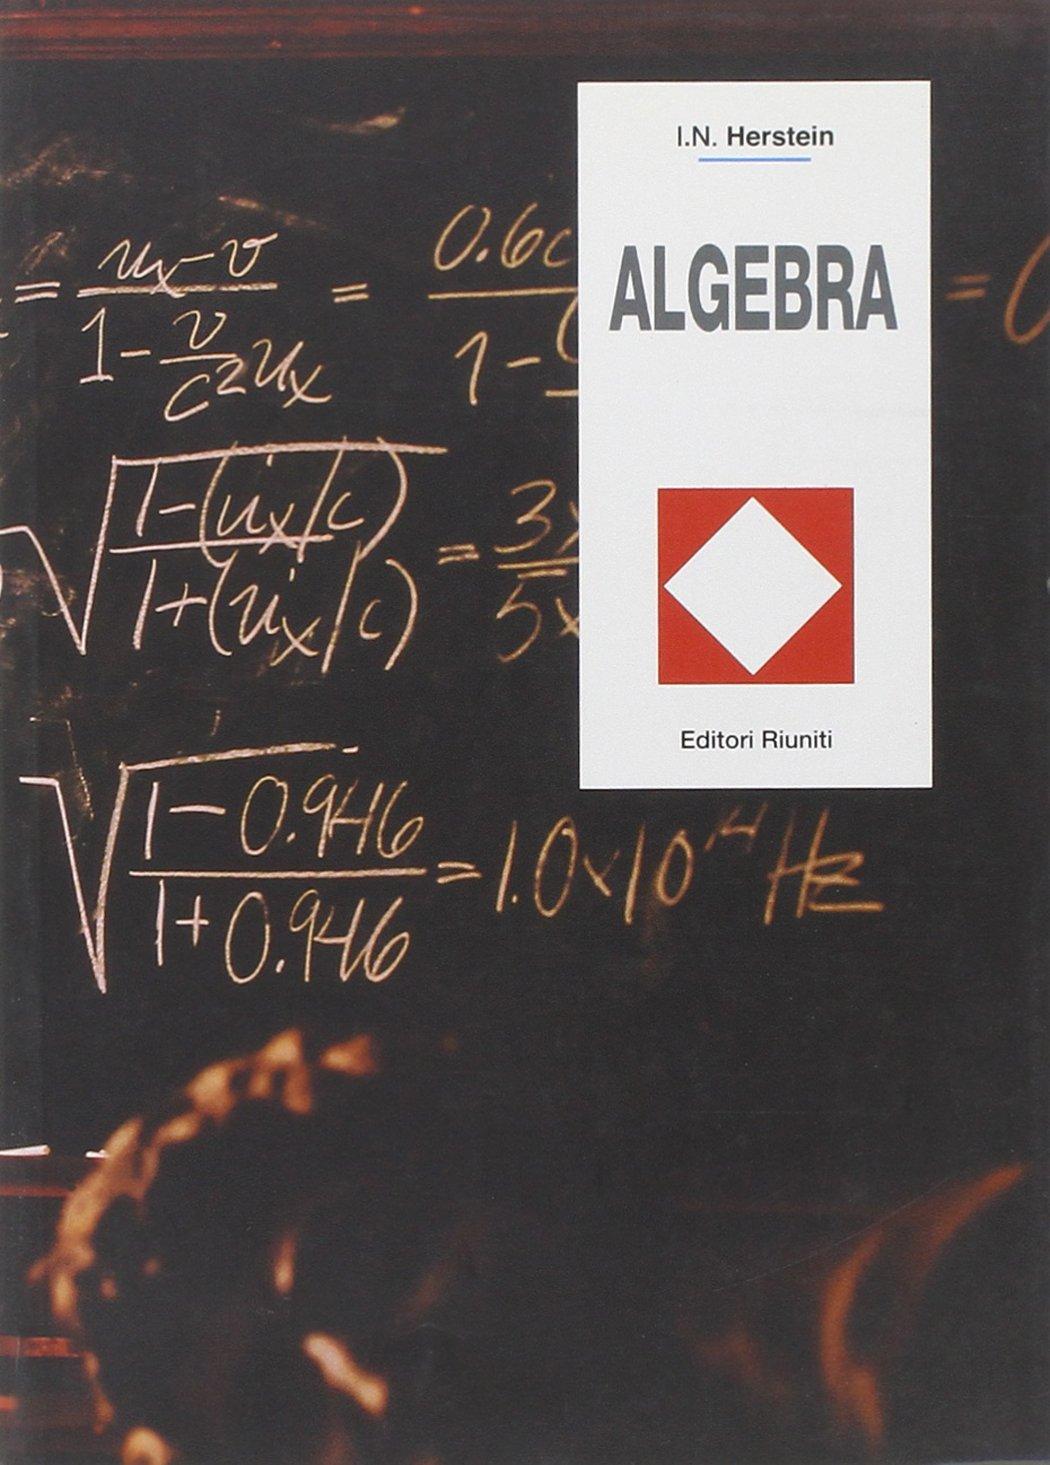 Comfortable Ixl Algebra Images - Math Worksheets - modopol.com